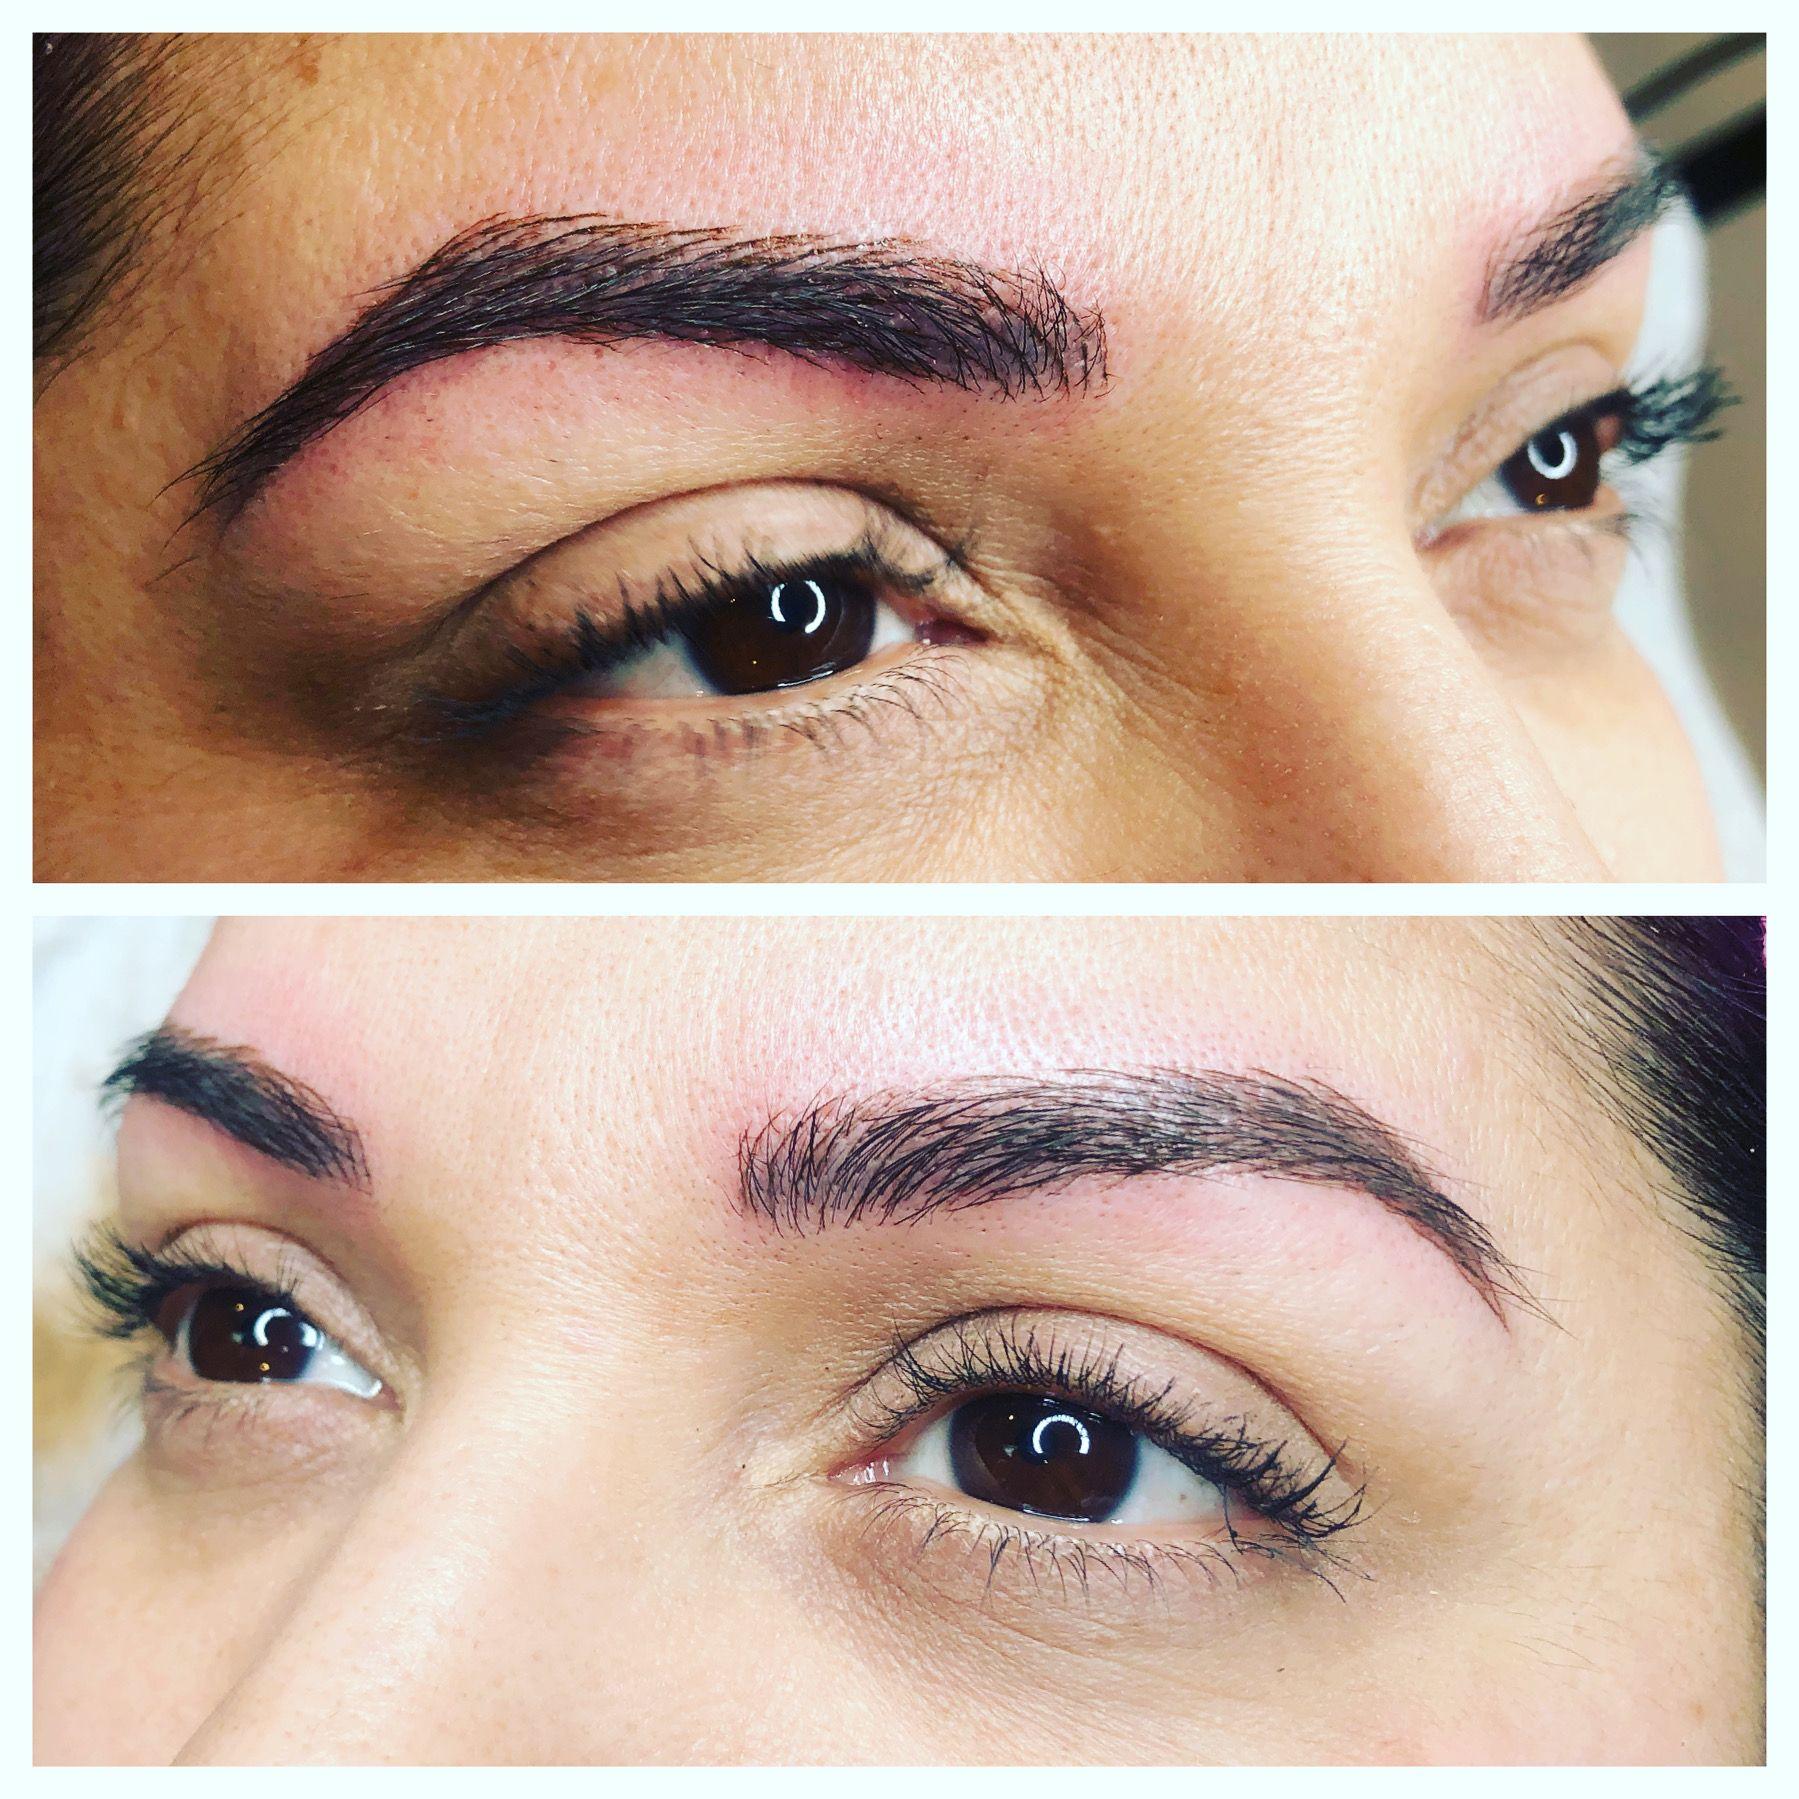 Tattoo eyebrows in 2020 Esthetics, Esthetician